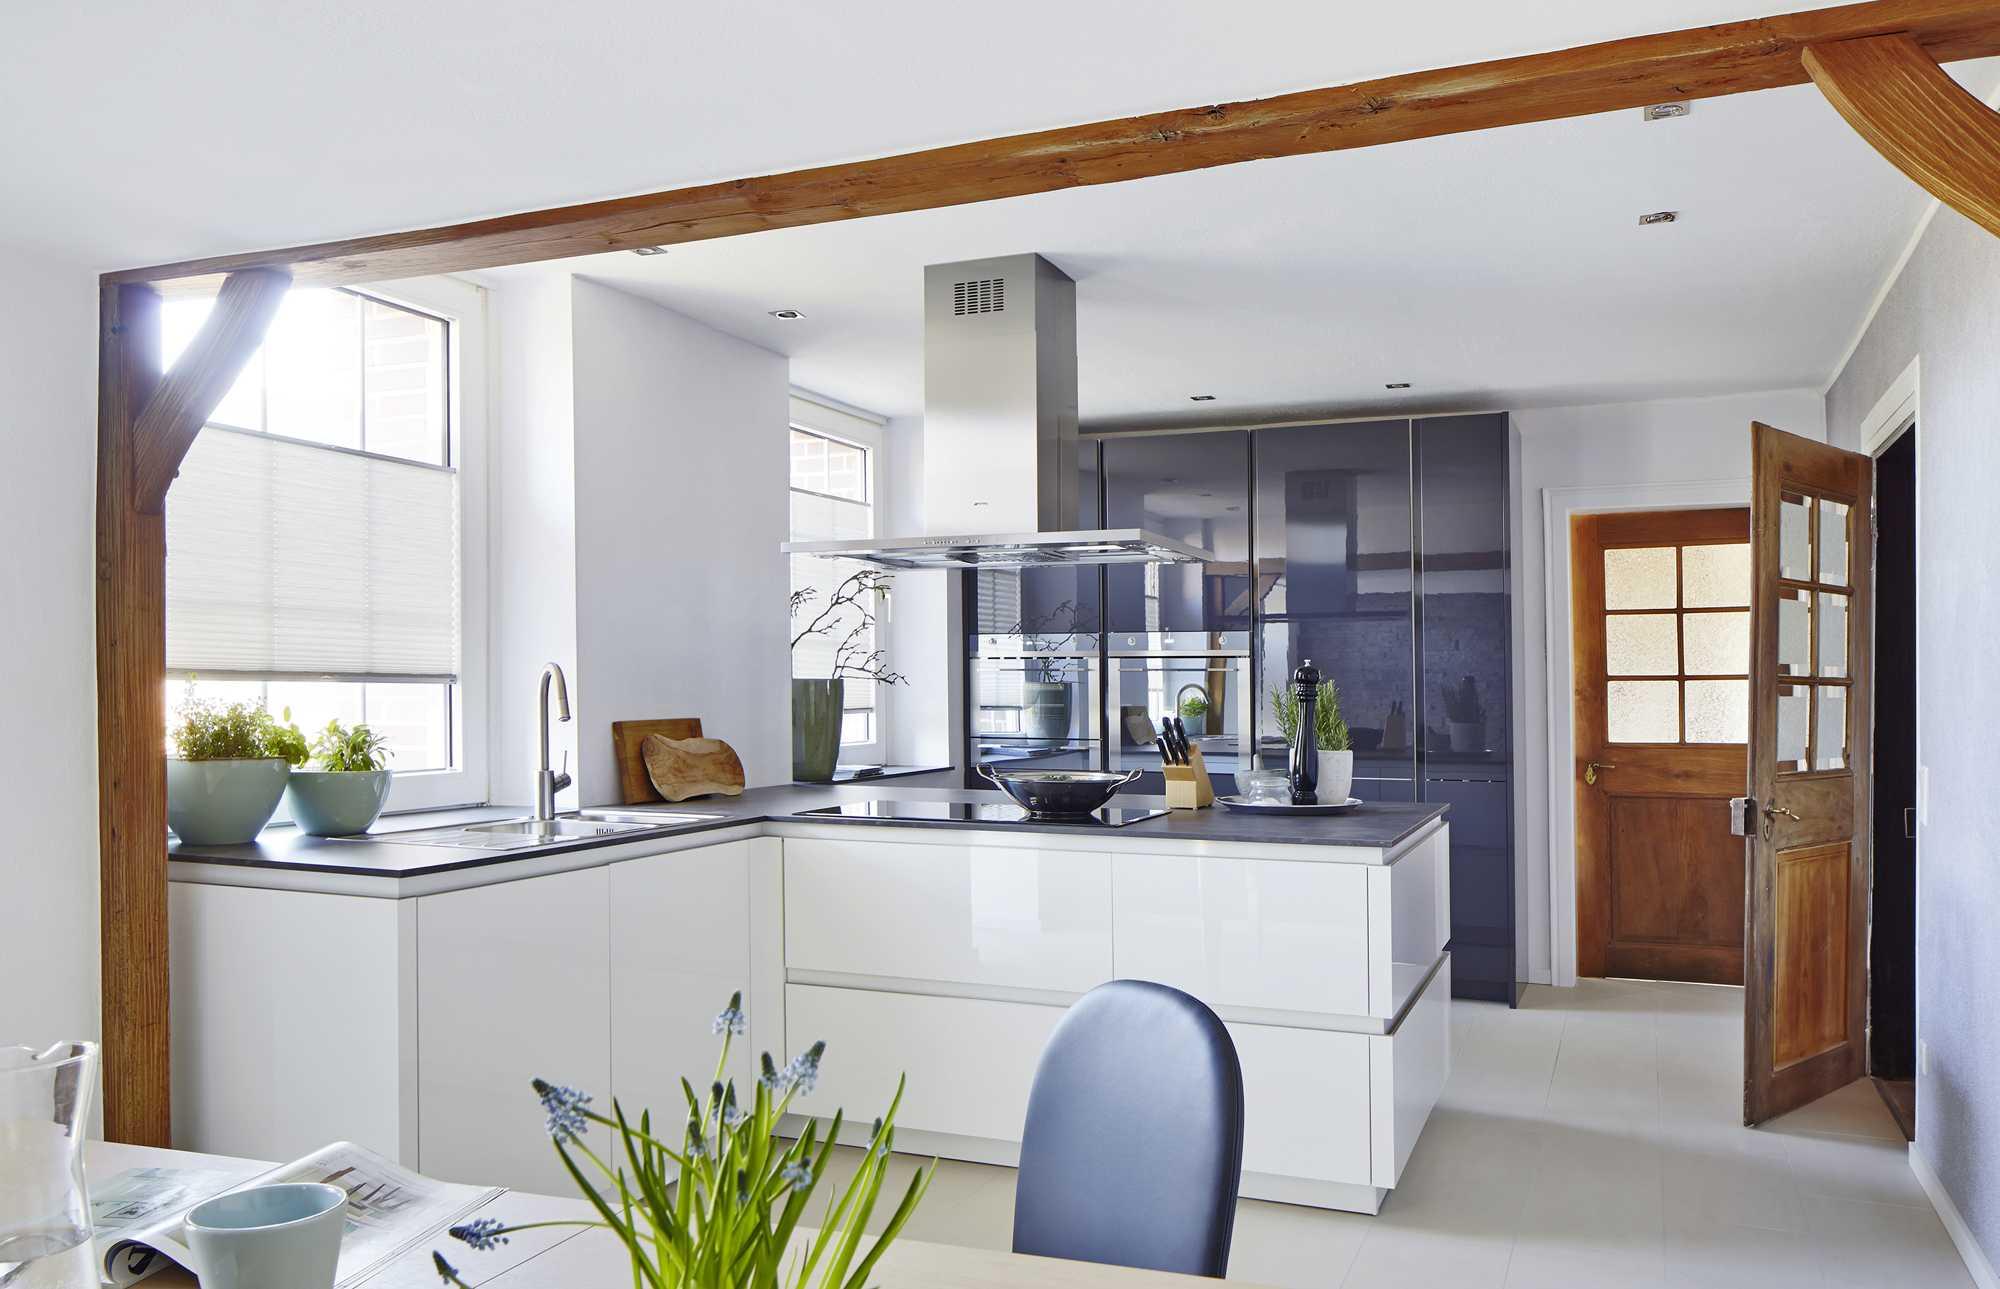 Stylish ZeroxHigh Gloss and deep Blue kitchen – a real eye-catcher. German Kitchen. Rotpunkt